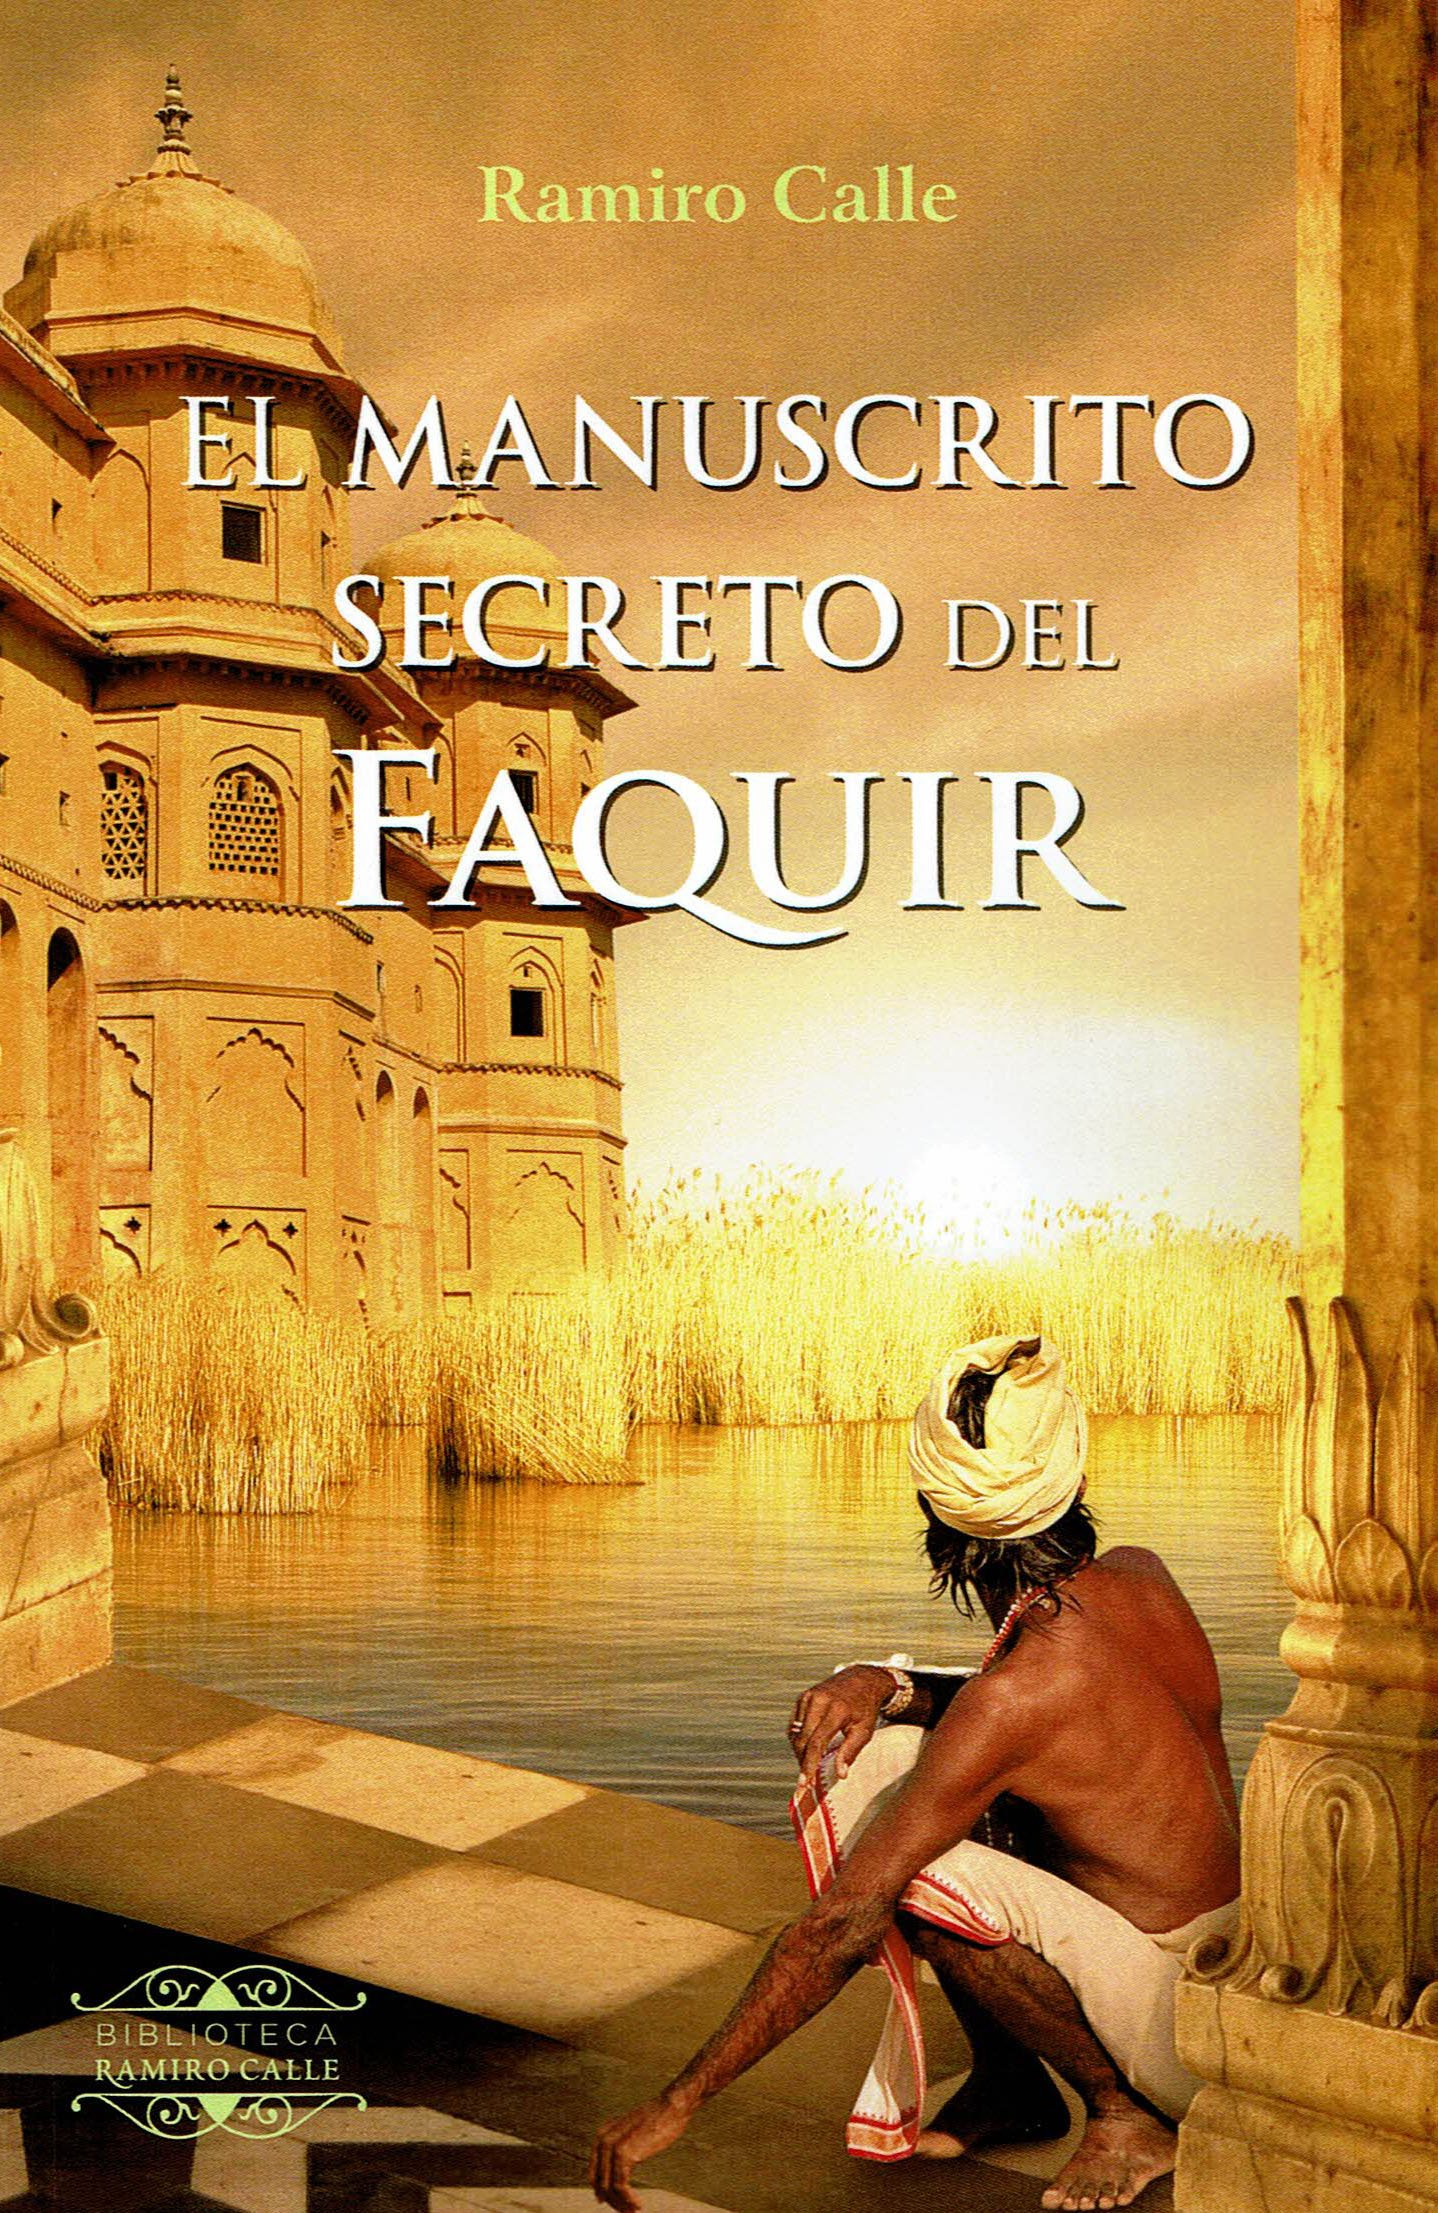 EL MANUSCRITO SECRETO DEL FAQUIR BIBLIOTECA RAMIRO CALLE: Amazon.es: Ramiro  Calle Capita: Libros